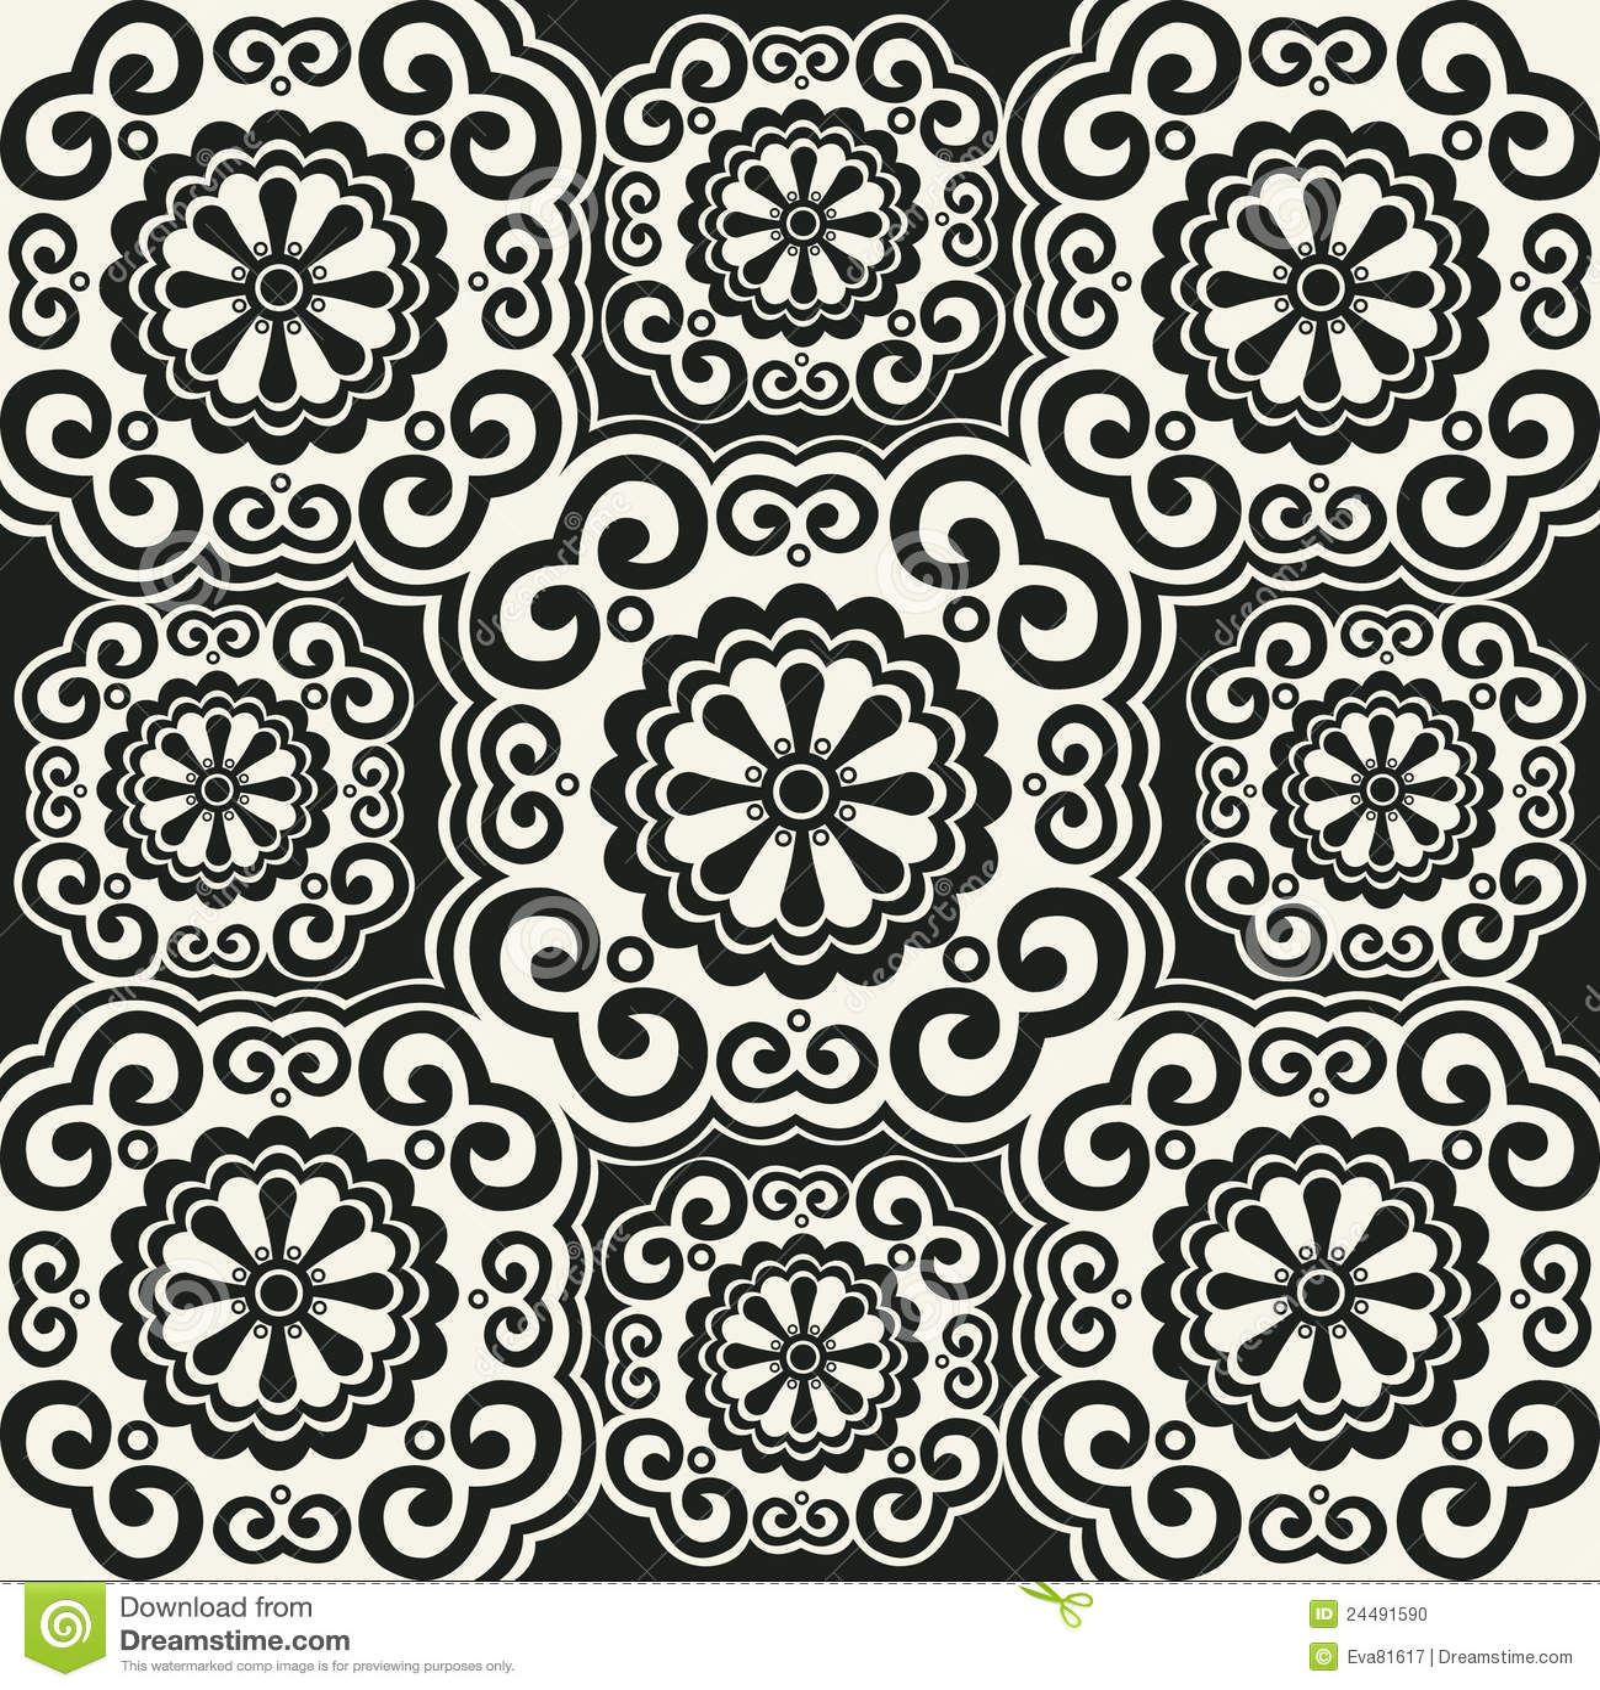 70s wallpaper patterns a - photo #4